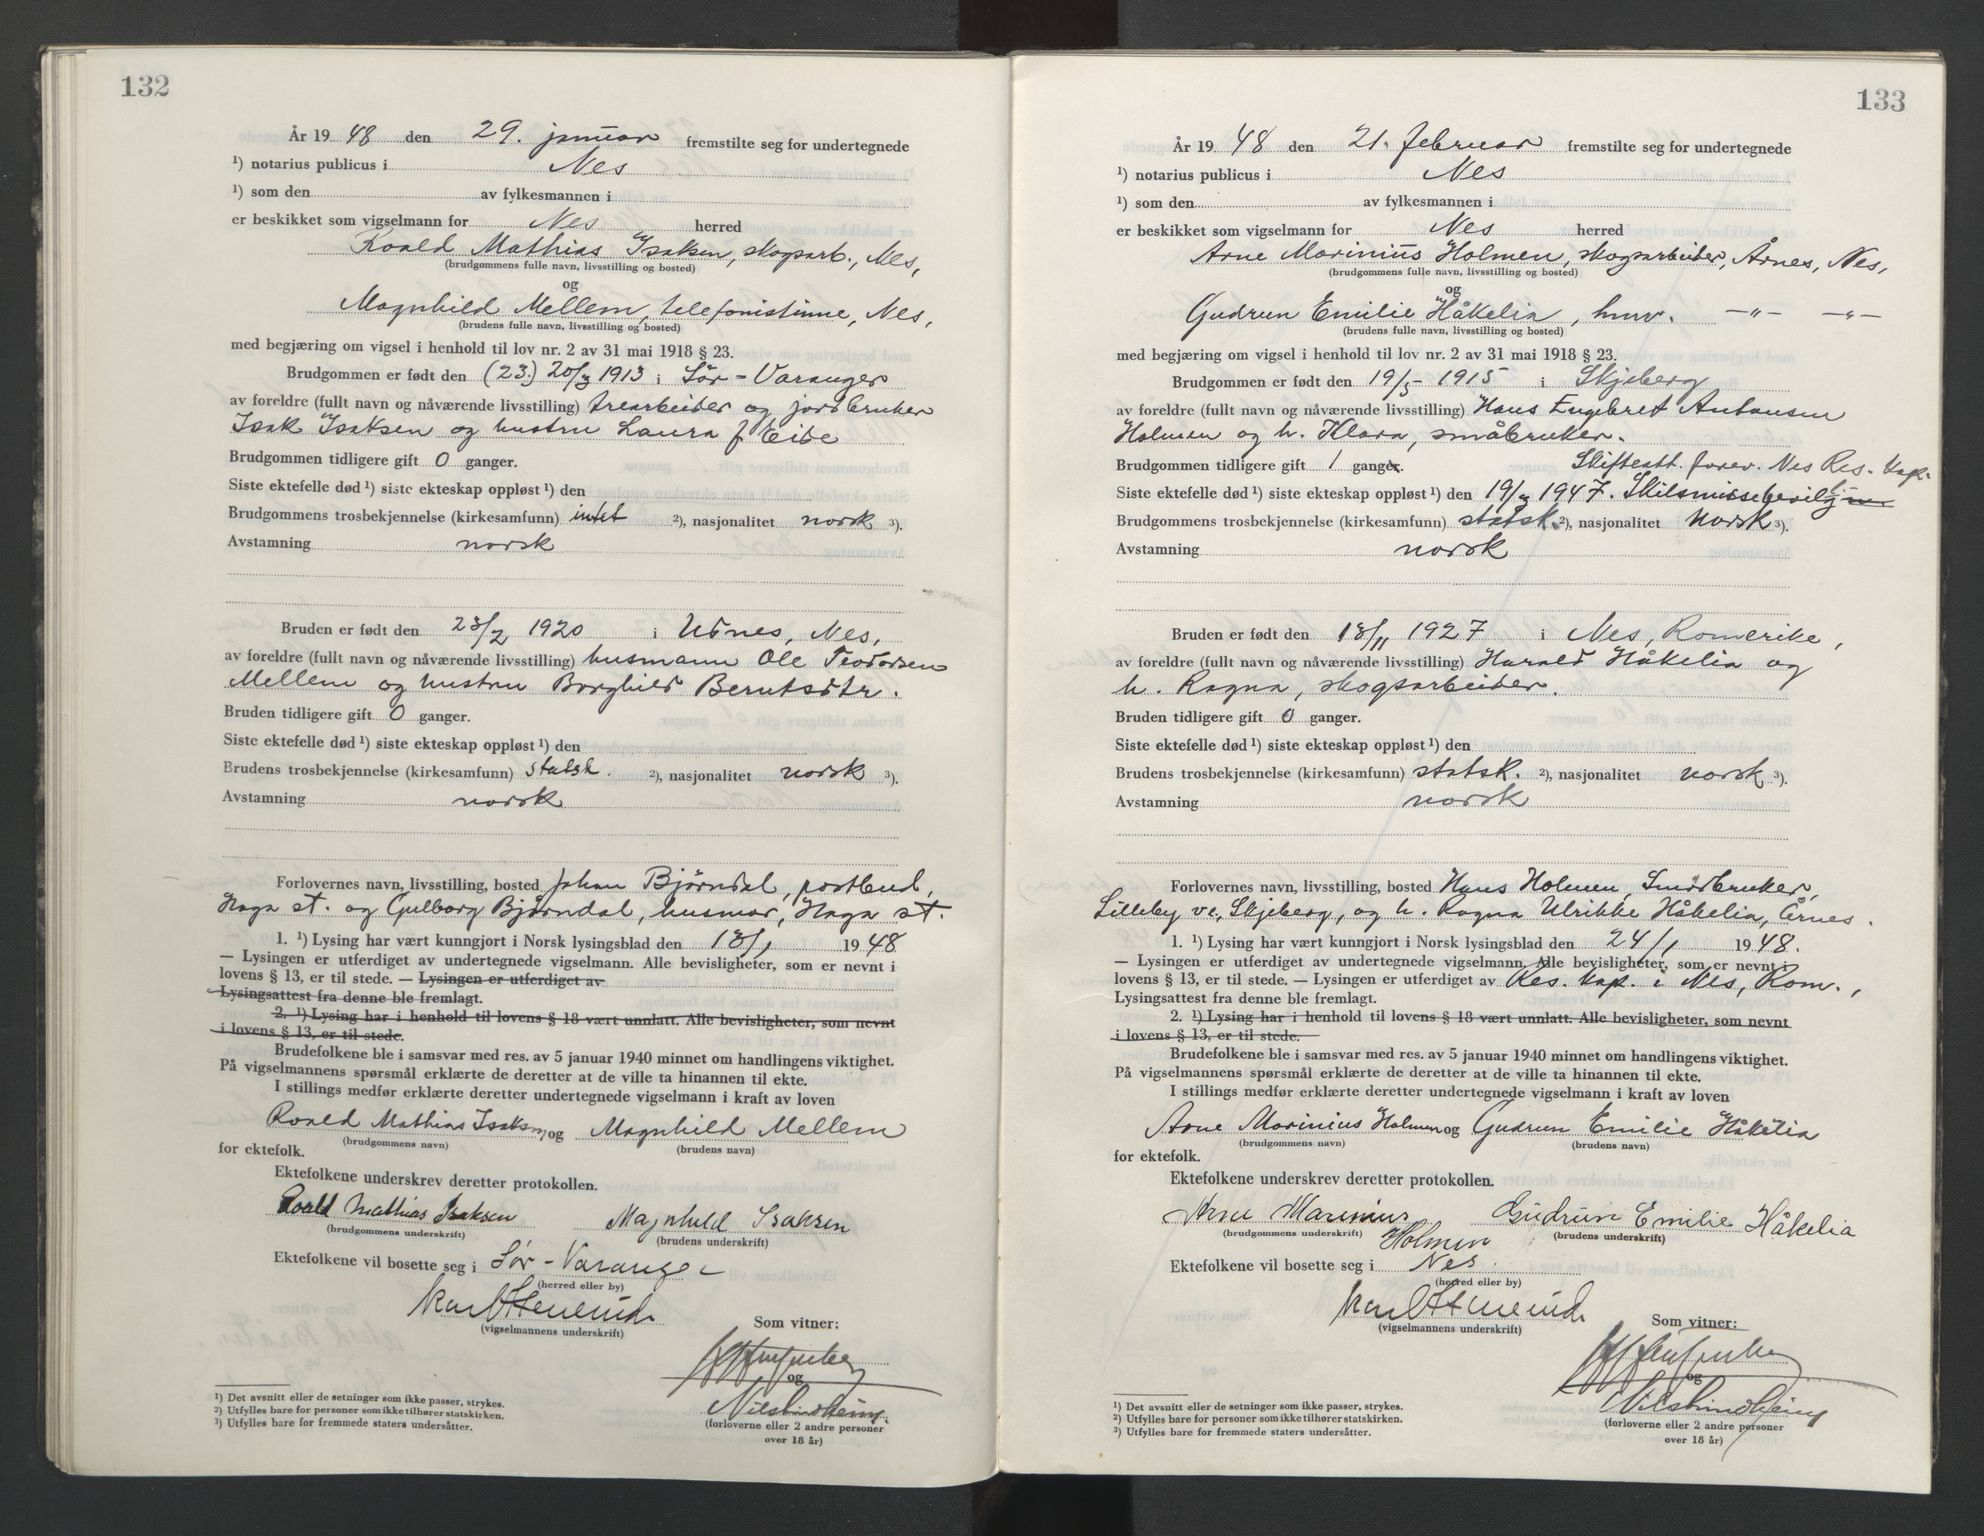 SAO, Nes tingrett, L/Lc/Lca/L0003: Vigselbok, 1944-1953, s. 132-133